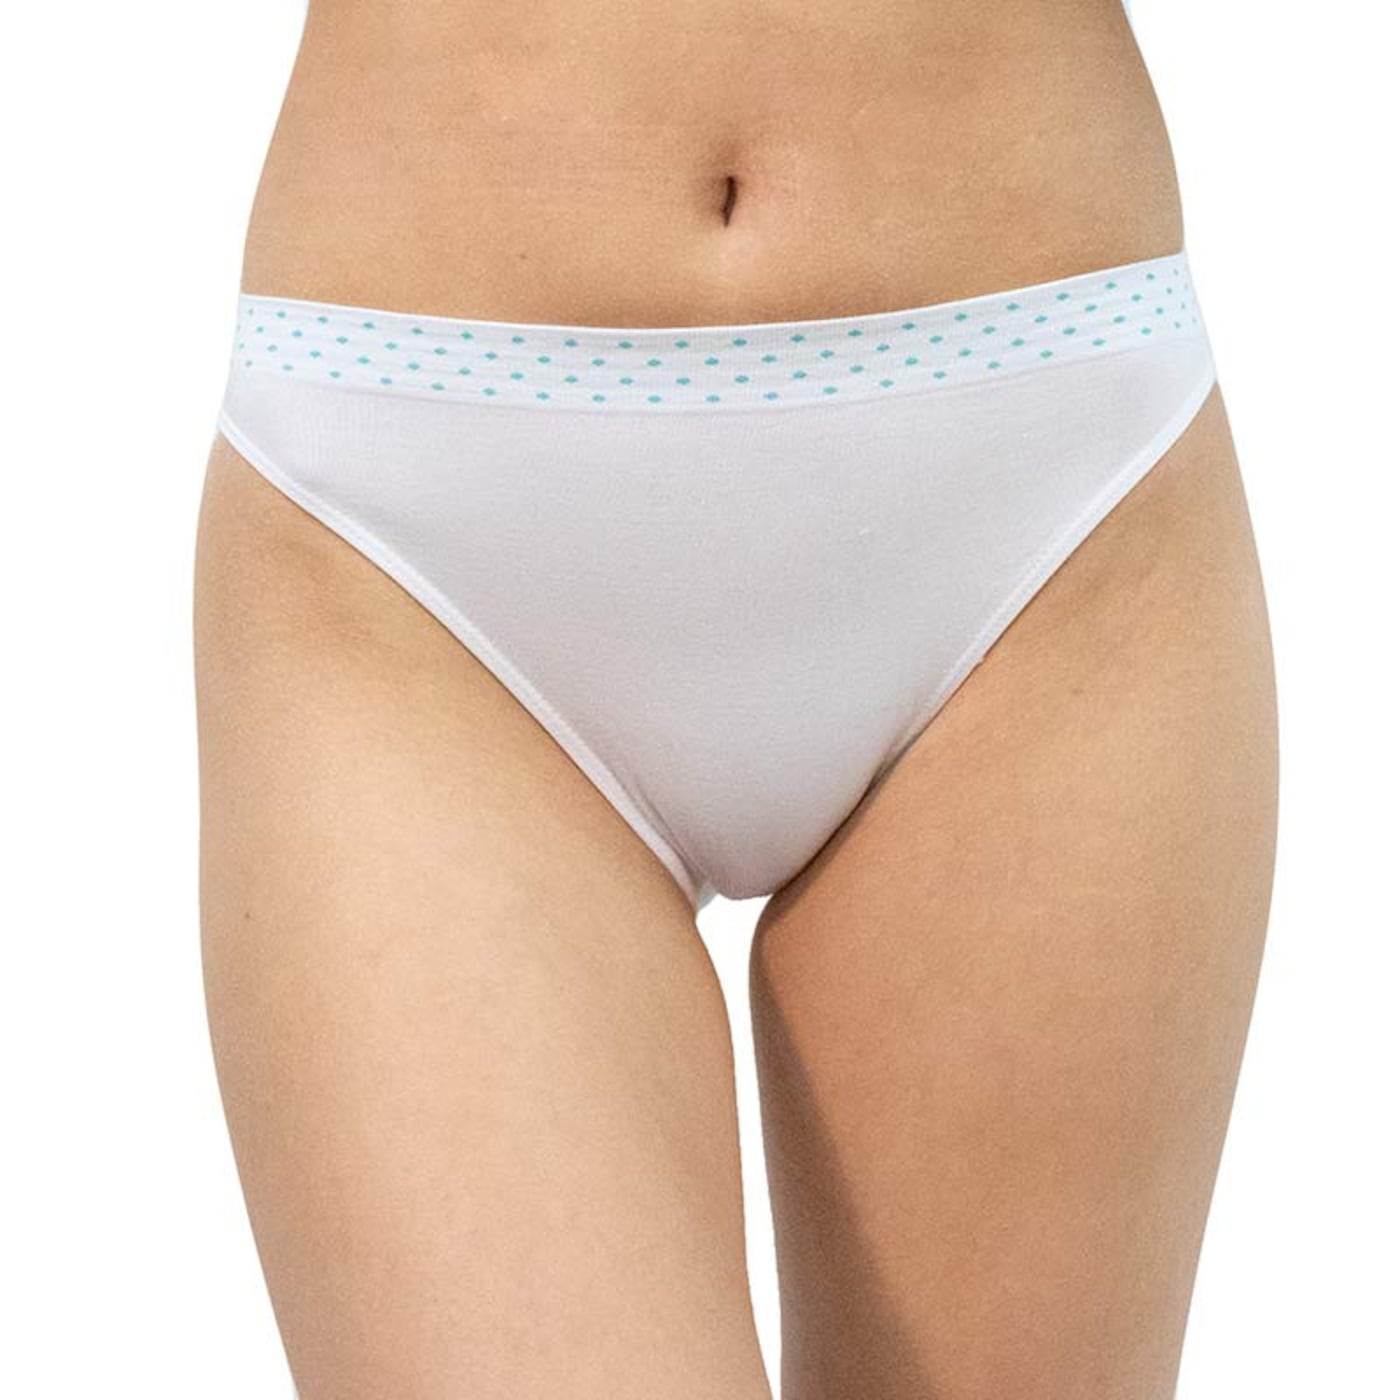 Women's panties Gina white  dámské Neurčeno S